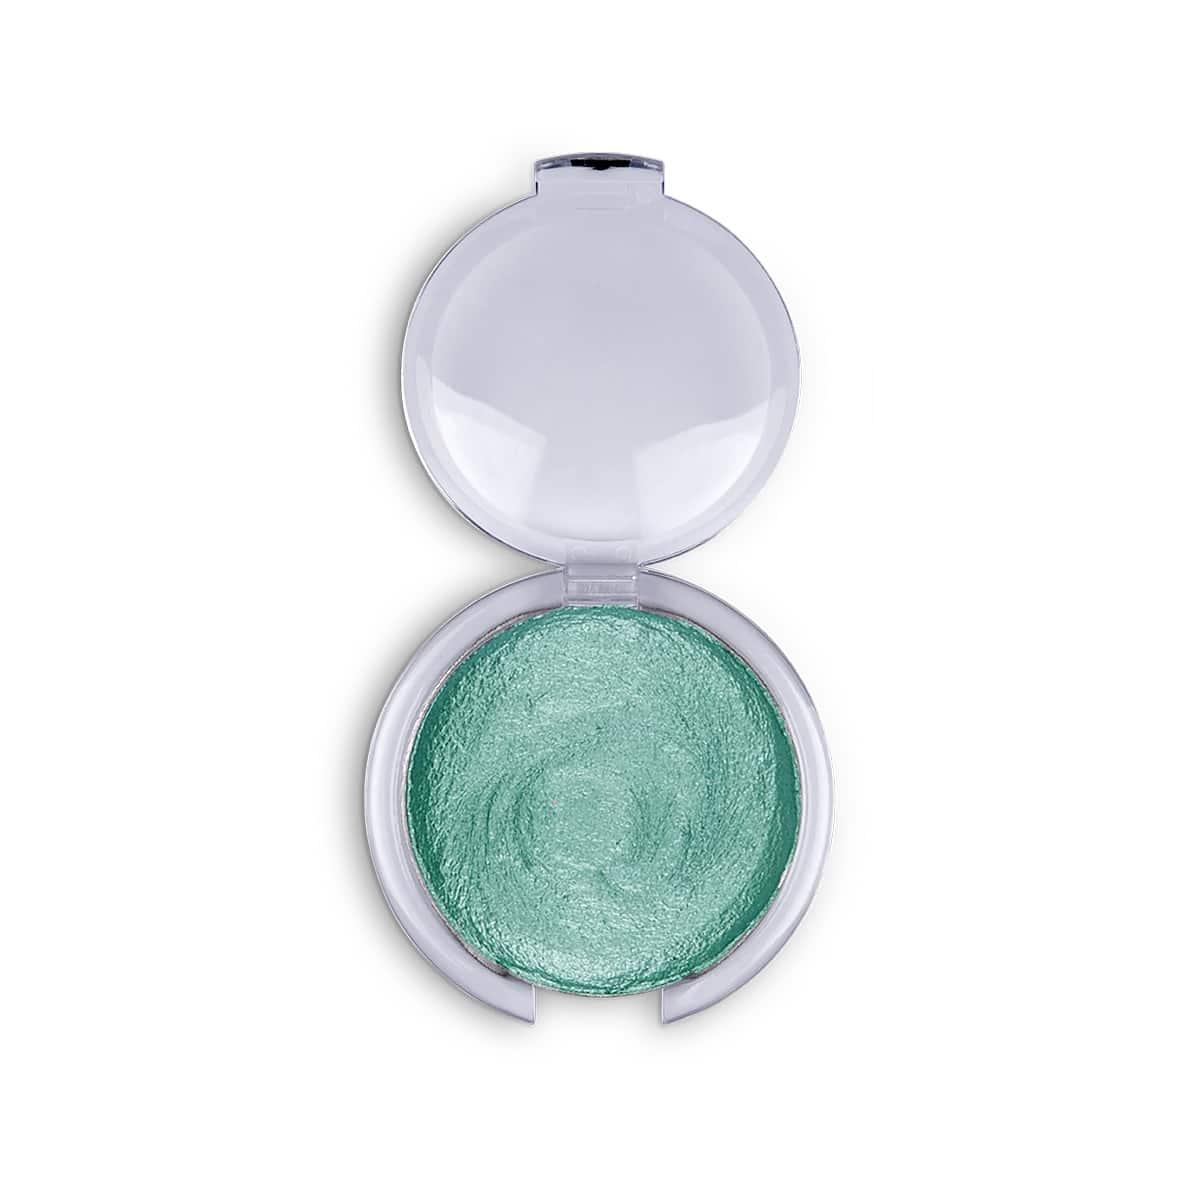 Peinture alimentaire 5 g – Green Tea